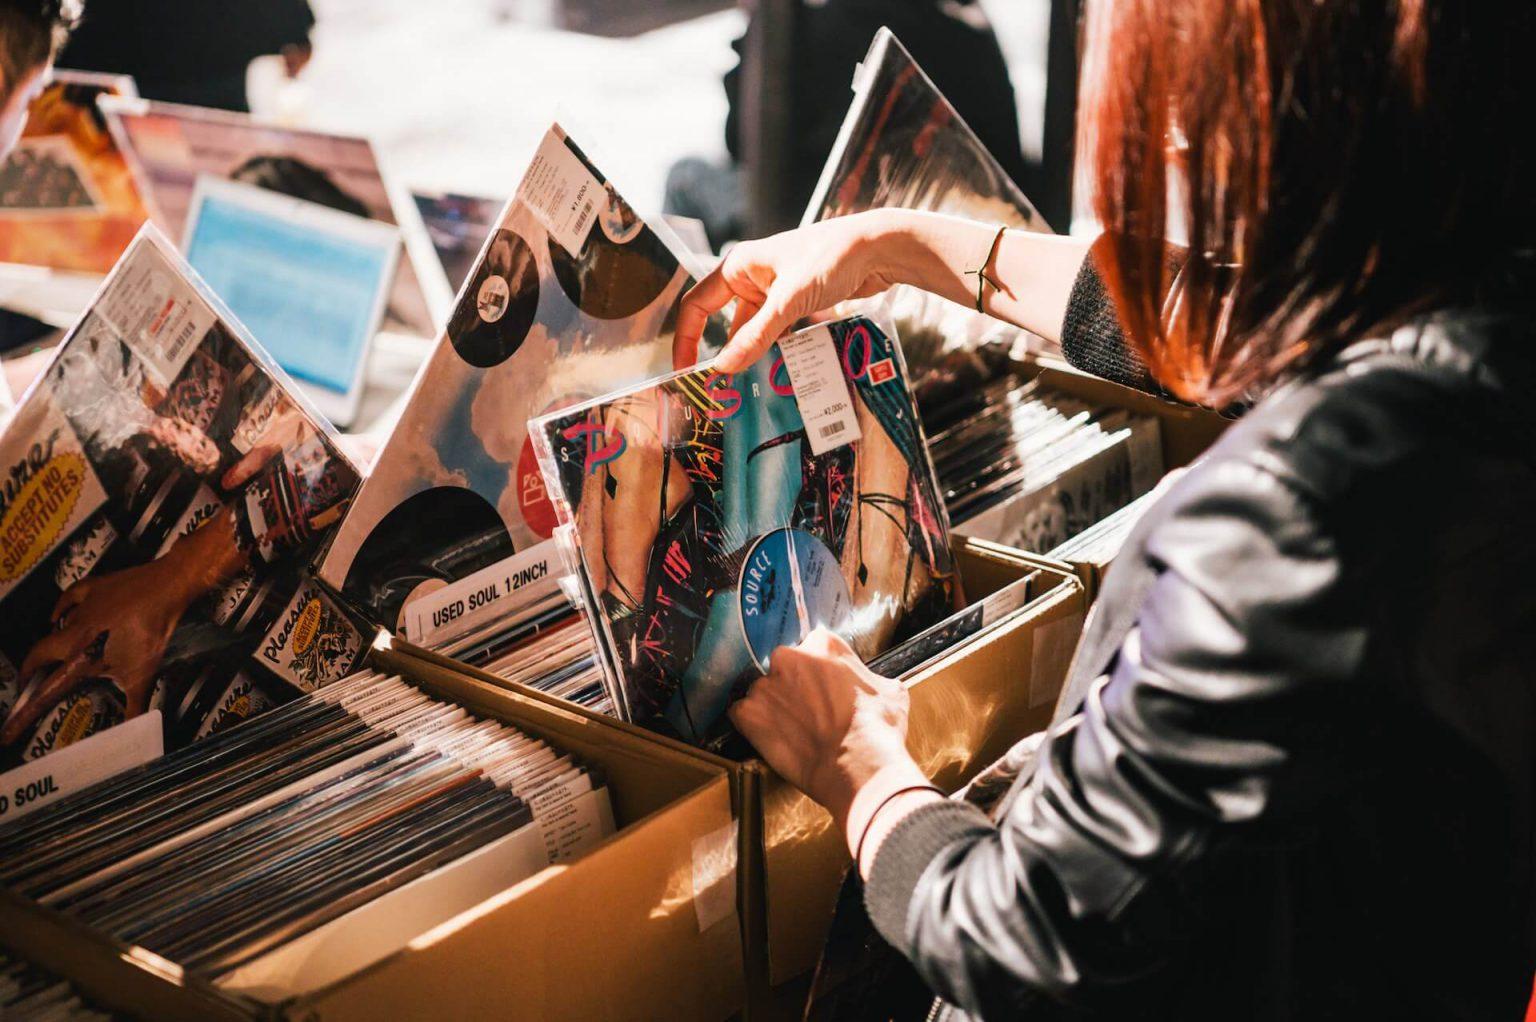 20191102_qetic-al-08-1440x959 レコード市と音楽パフォーマンスを同時に楽しめるレコード・フェス:Discogs Presents Mystic Crates